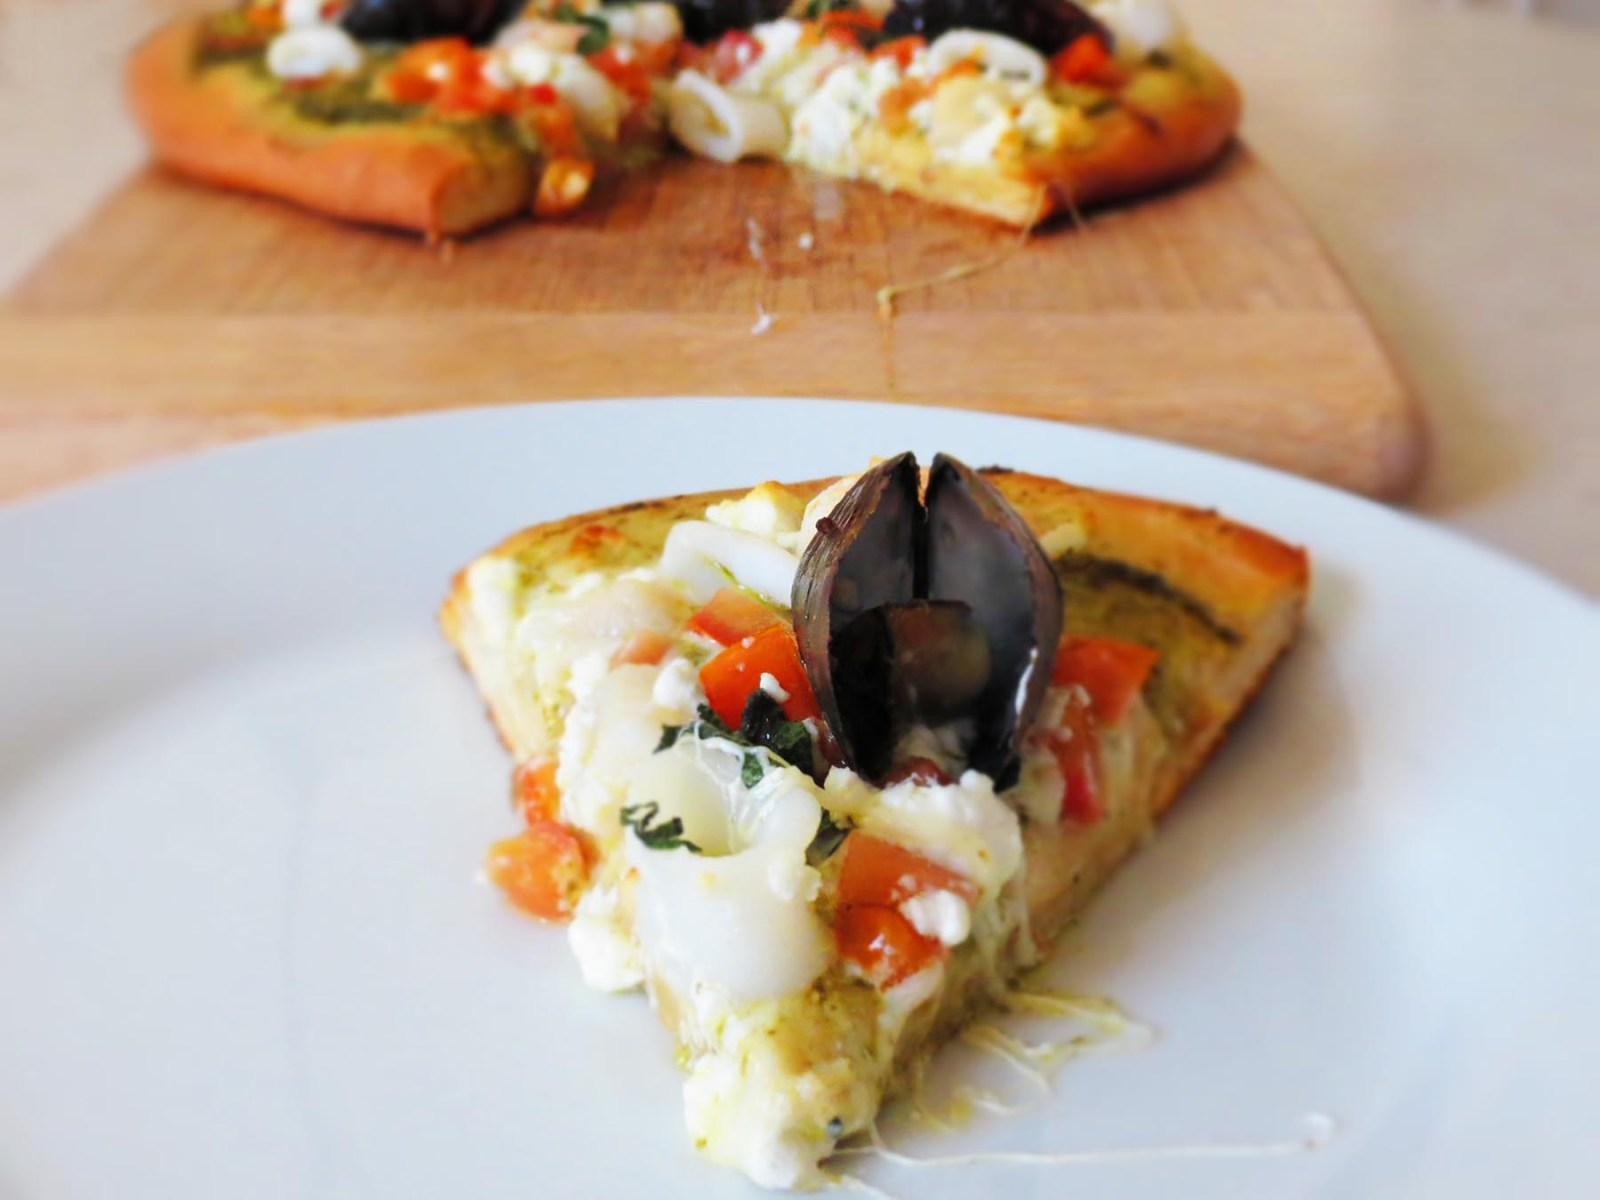 slice-of-pizza